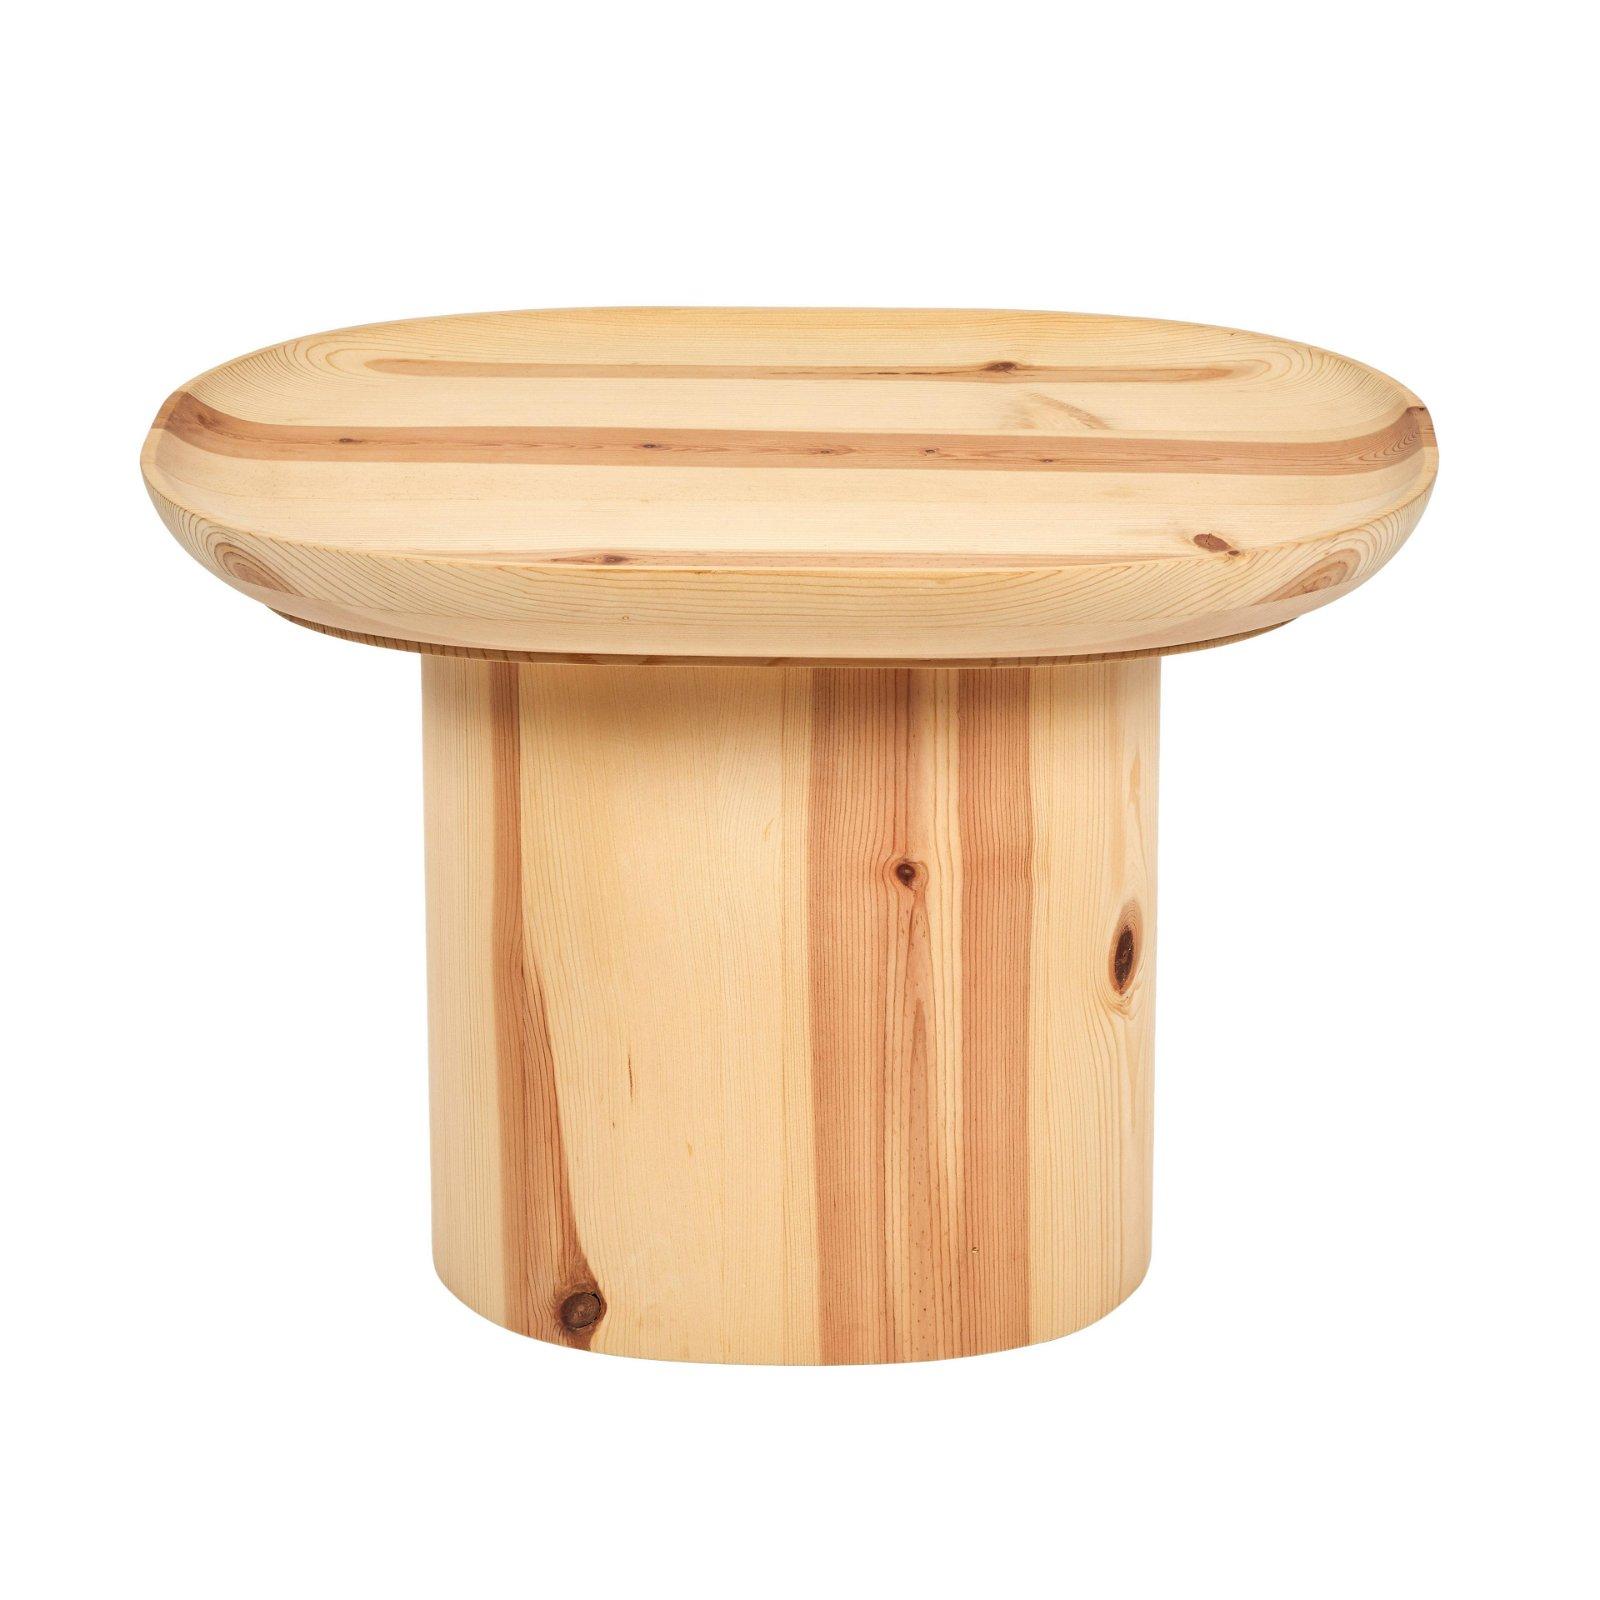 Axel Einar Hjorth Style Side Table